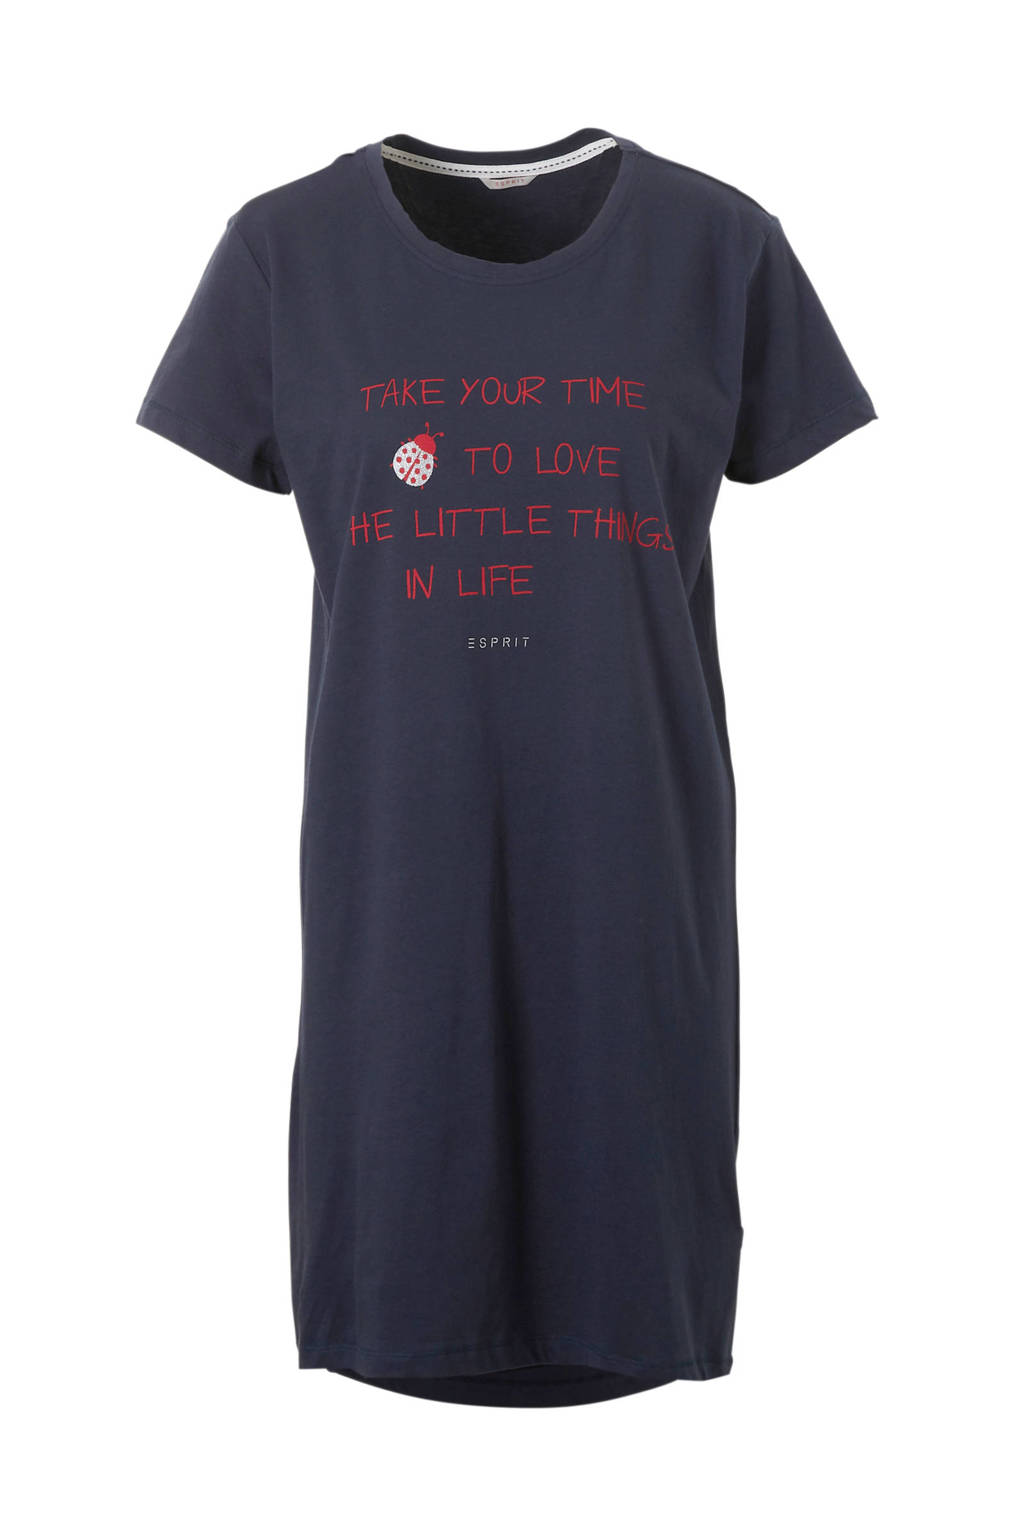 ESPRIT Women Bodywear nachthemd met tekstopdruk marine, Marine/rood